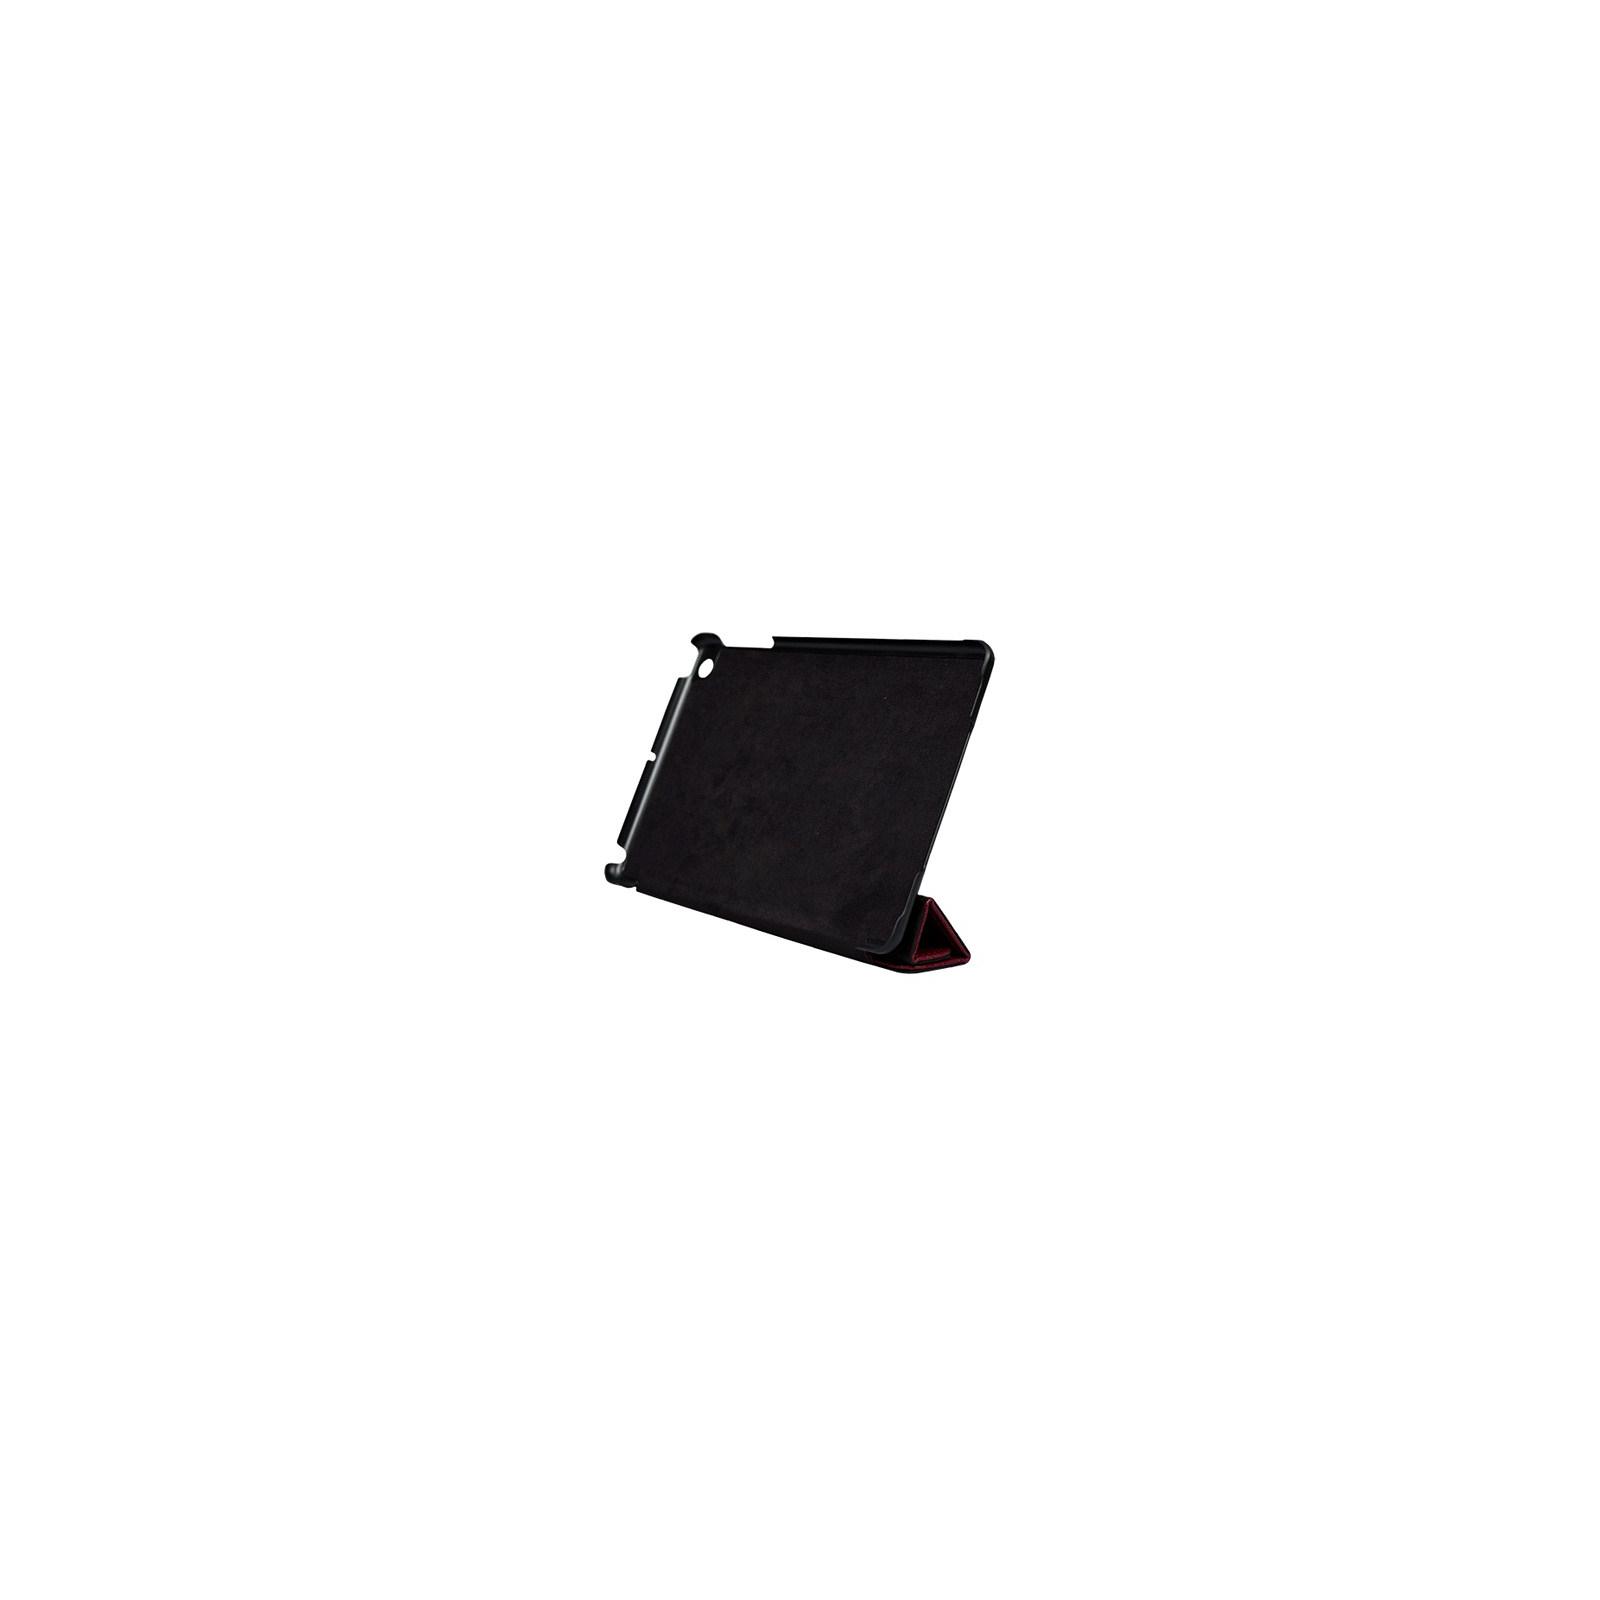 Чехол для планшета Continent iPad mini (IPM-41VI) изображение 2